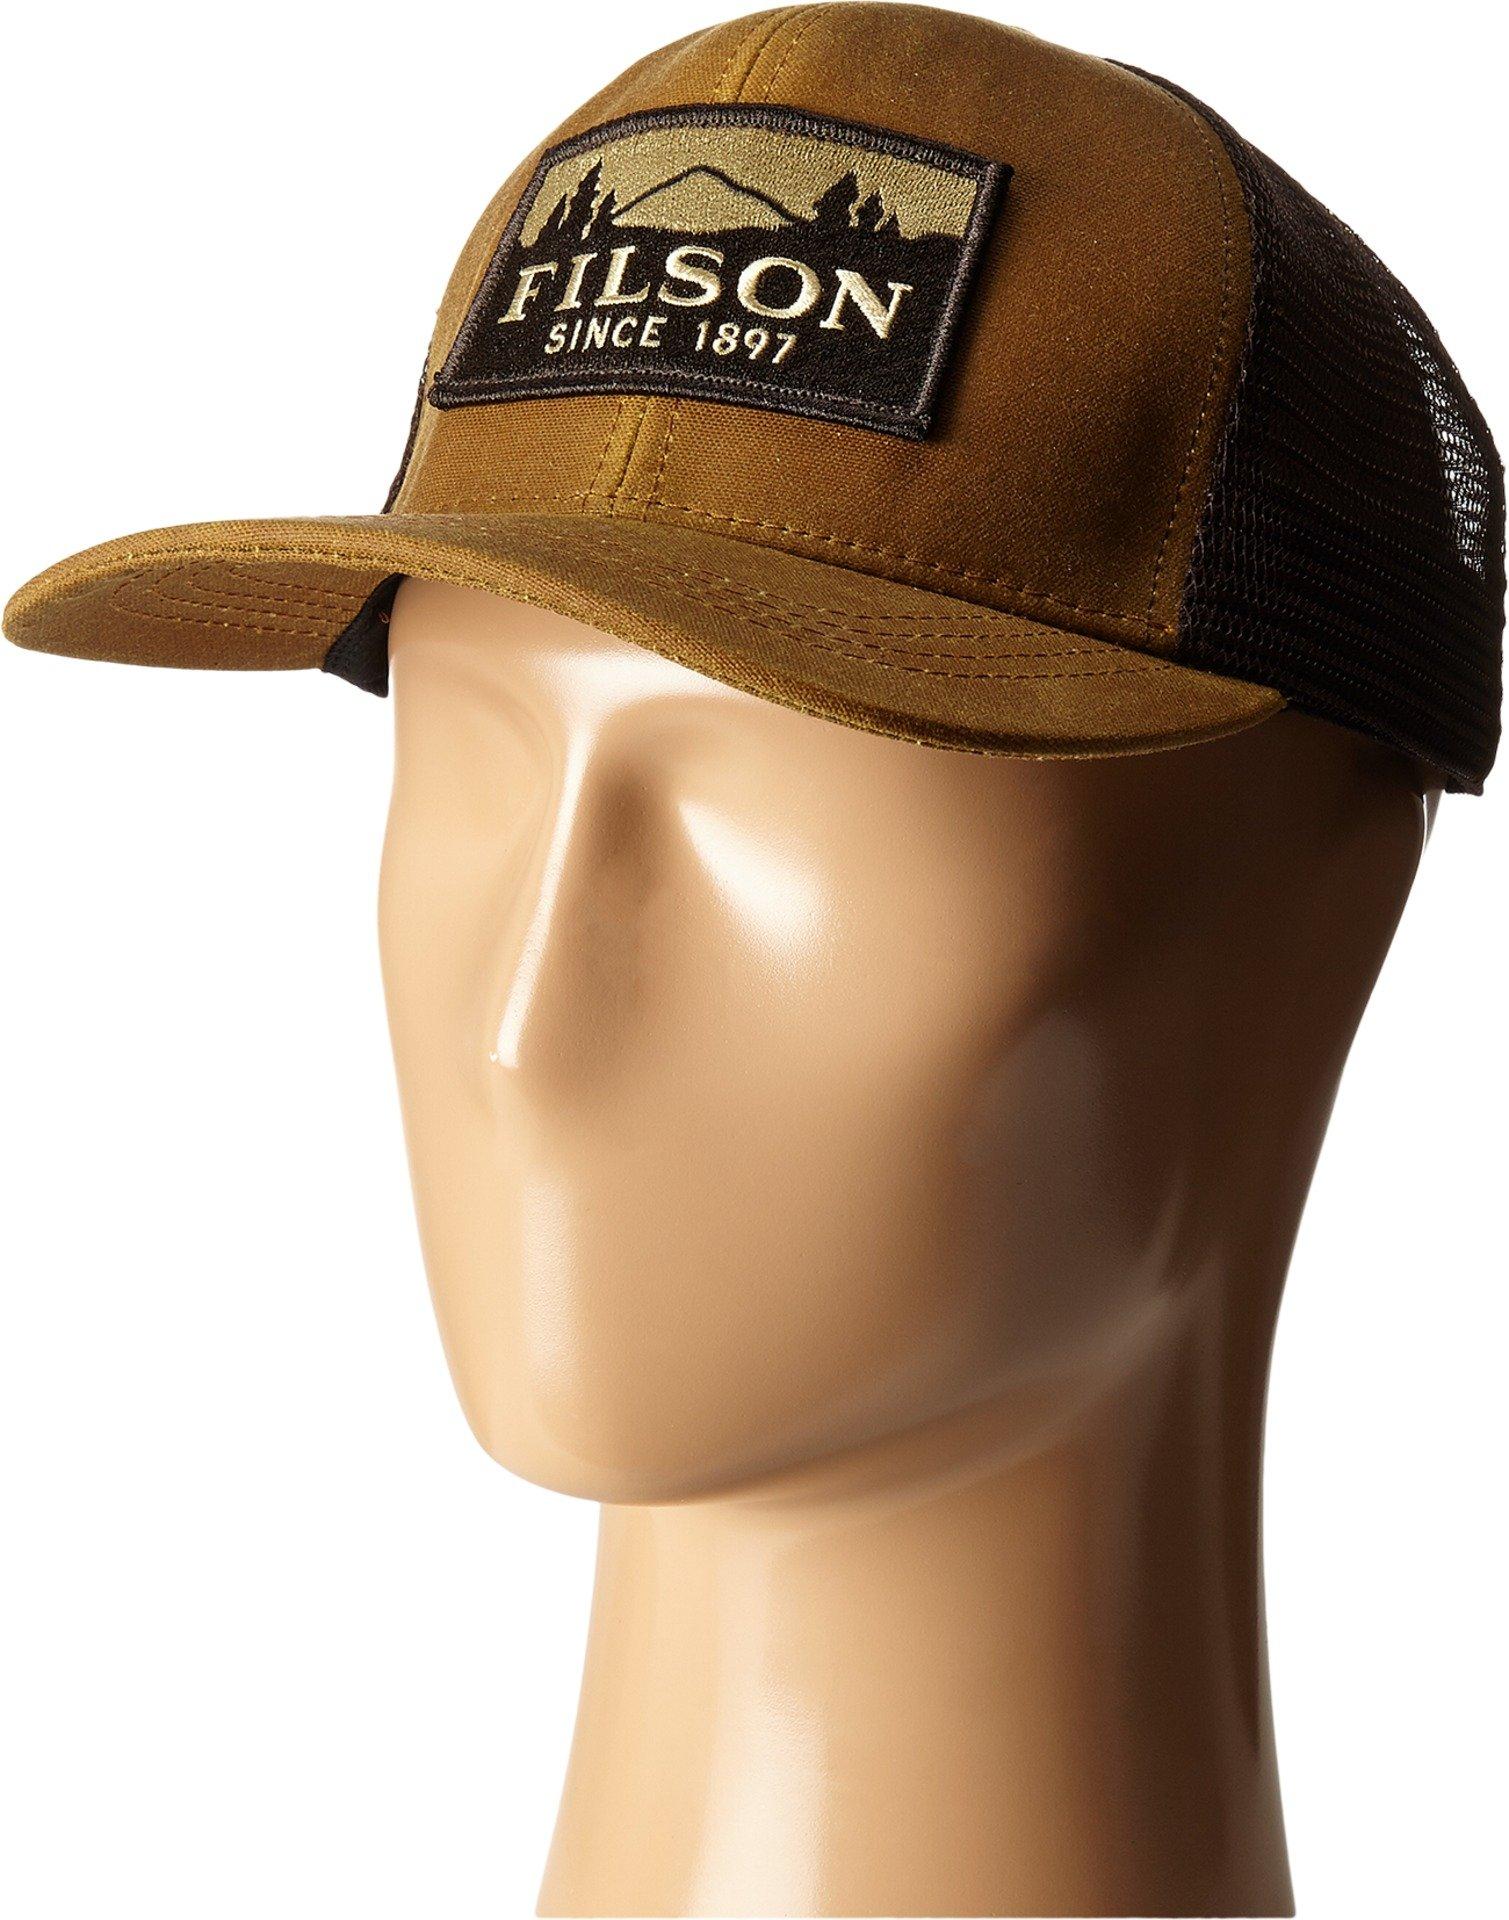 Filson Unisex Logger Mesh Cap Dark Tan Hat